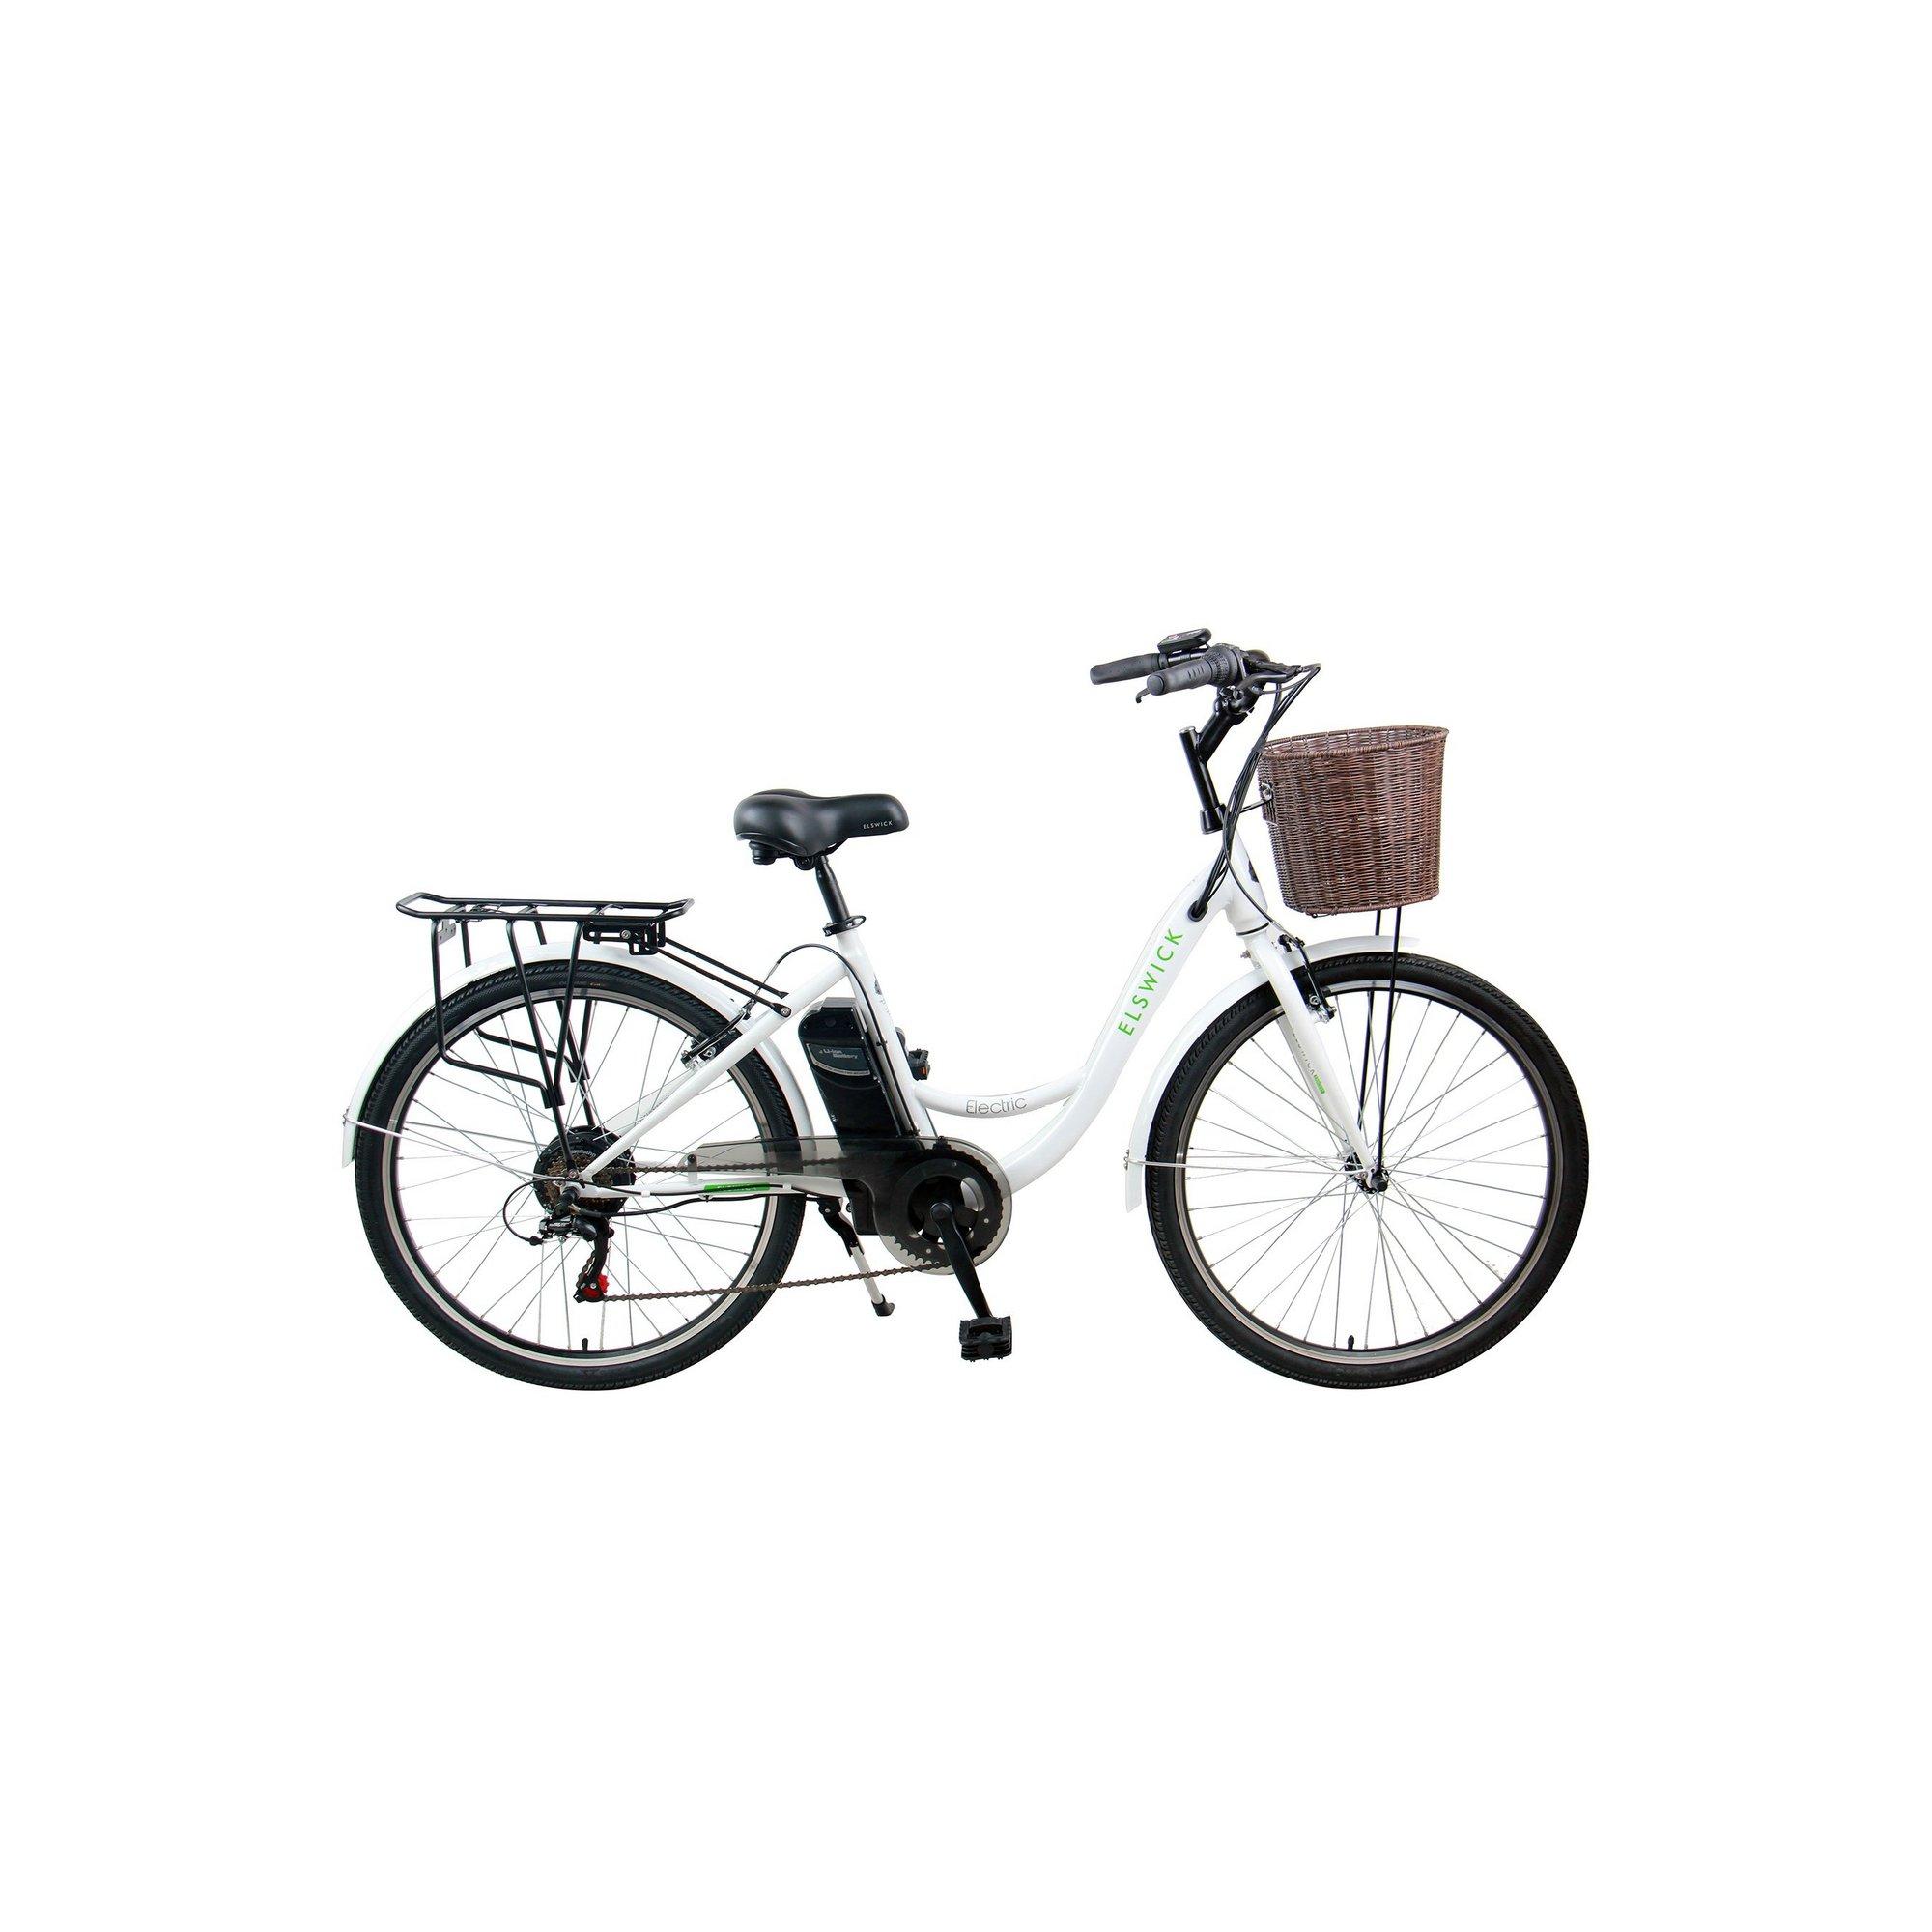 Image of Elswick Electric 24V7.8Ah Electric Bike